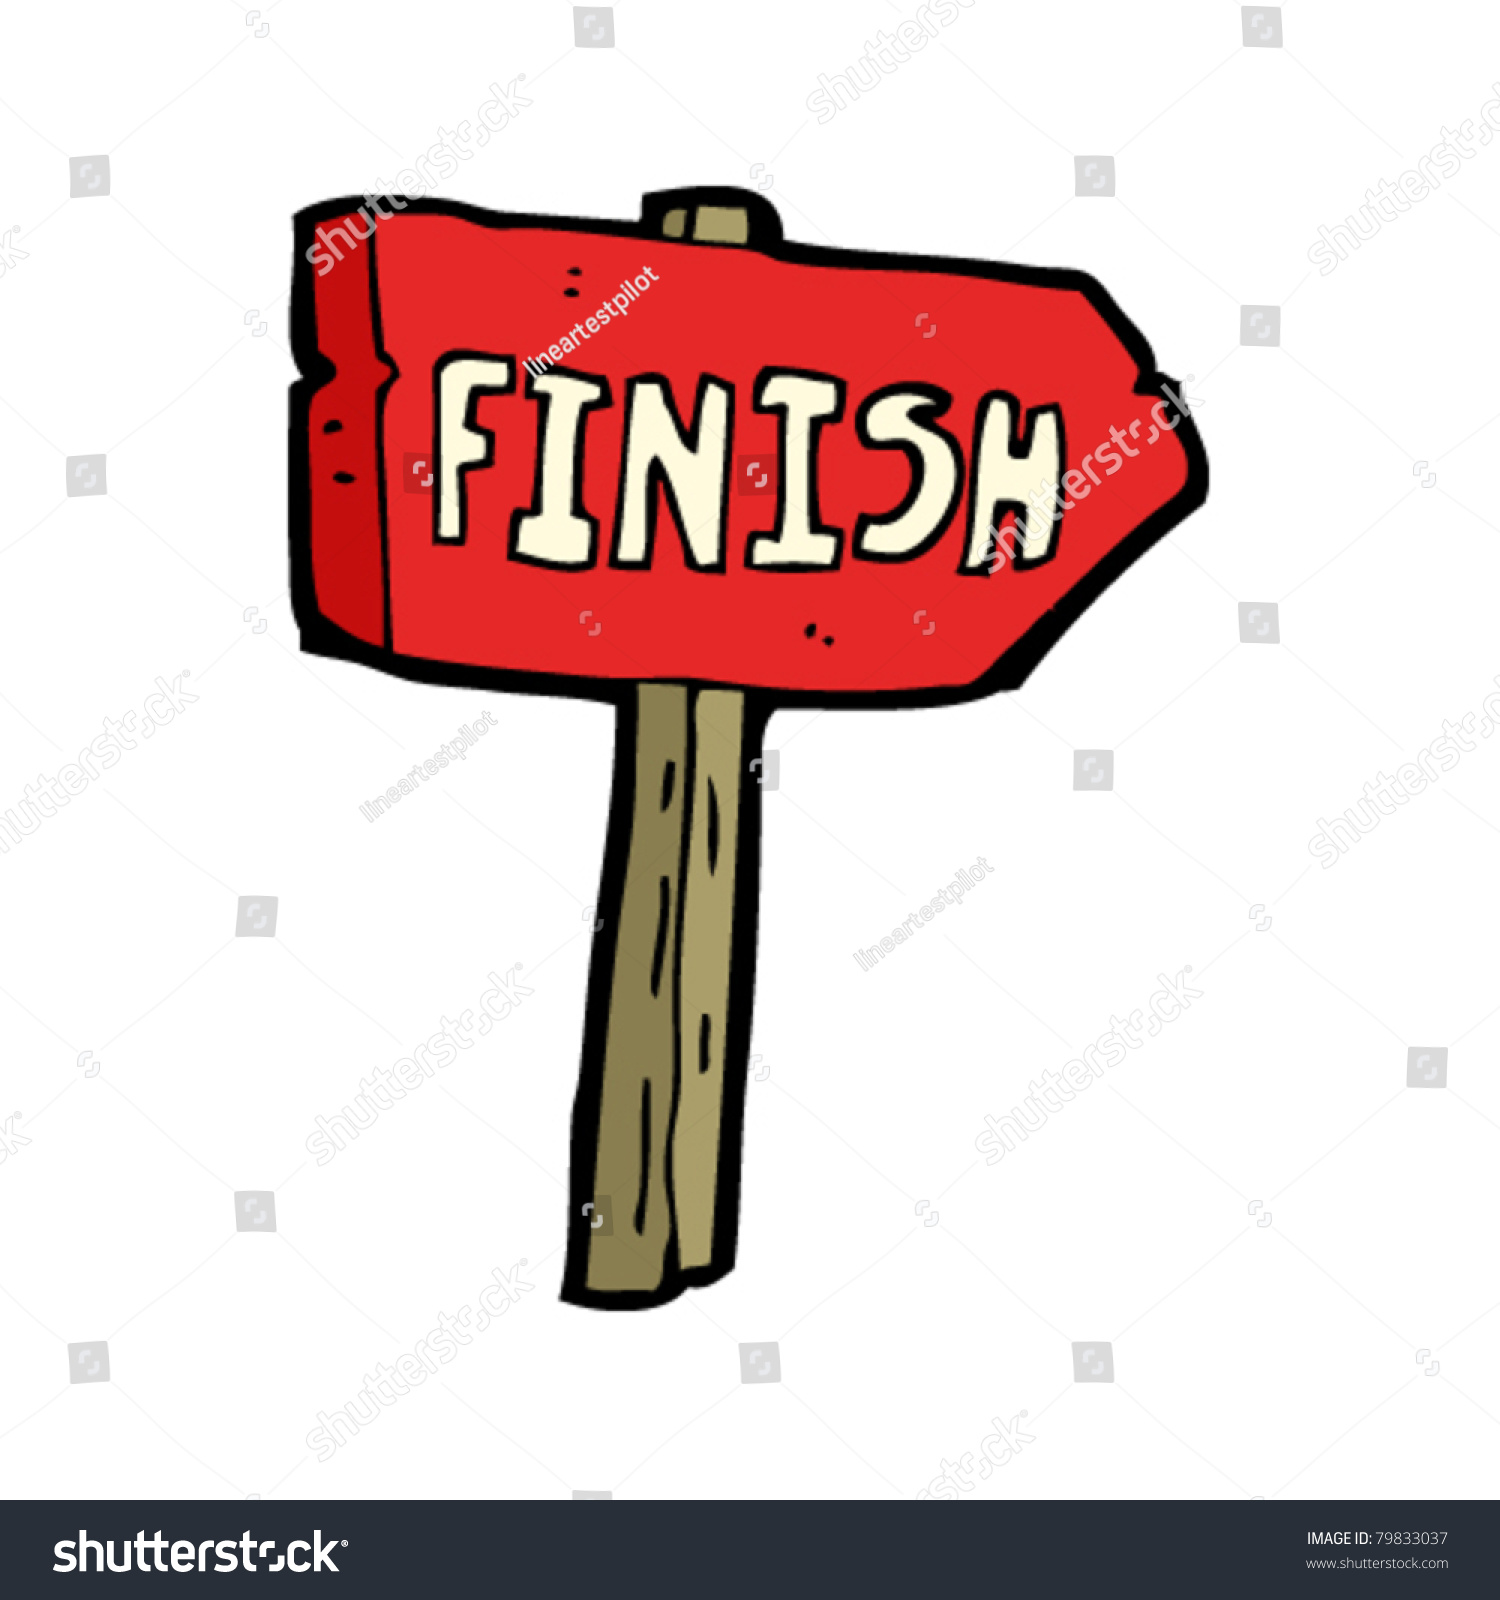 finish sign cartoon stock vector royalty free 79833037 shutterstock